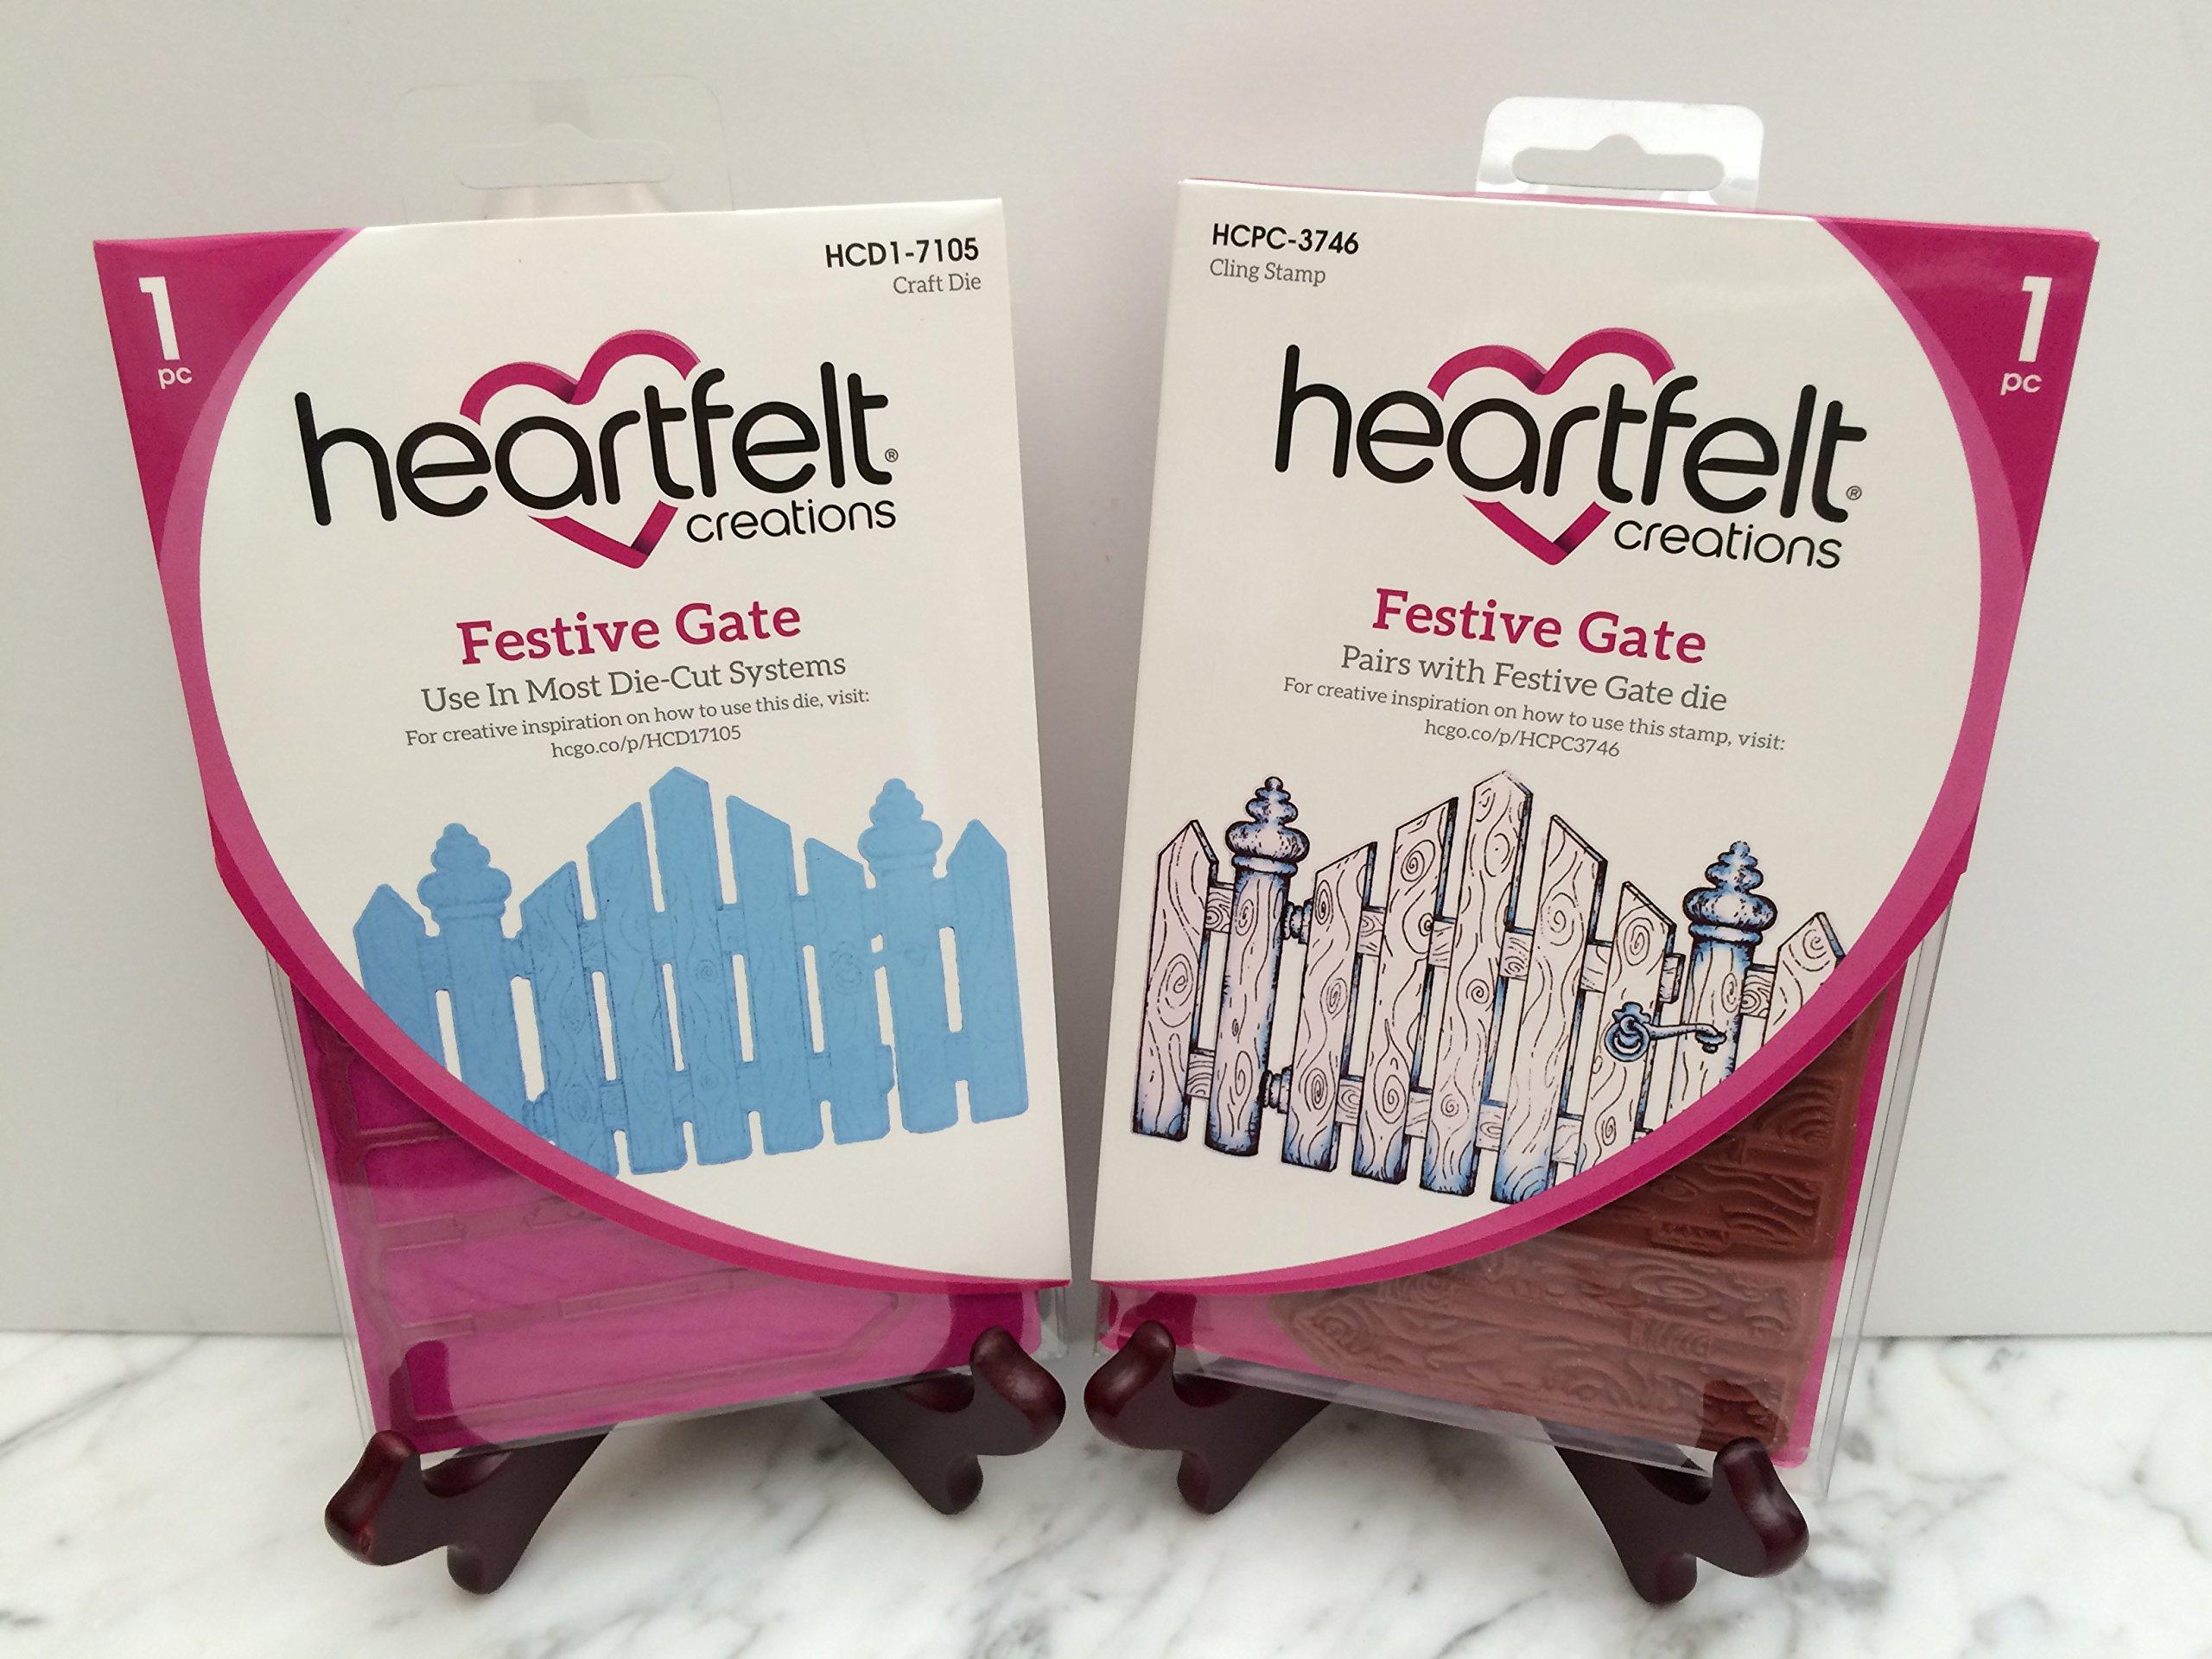 Heartfelt Creations Bundle Dies+Stamp Set Festive Gate, HCD1-7105+HCPC3746